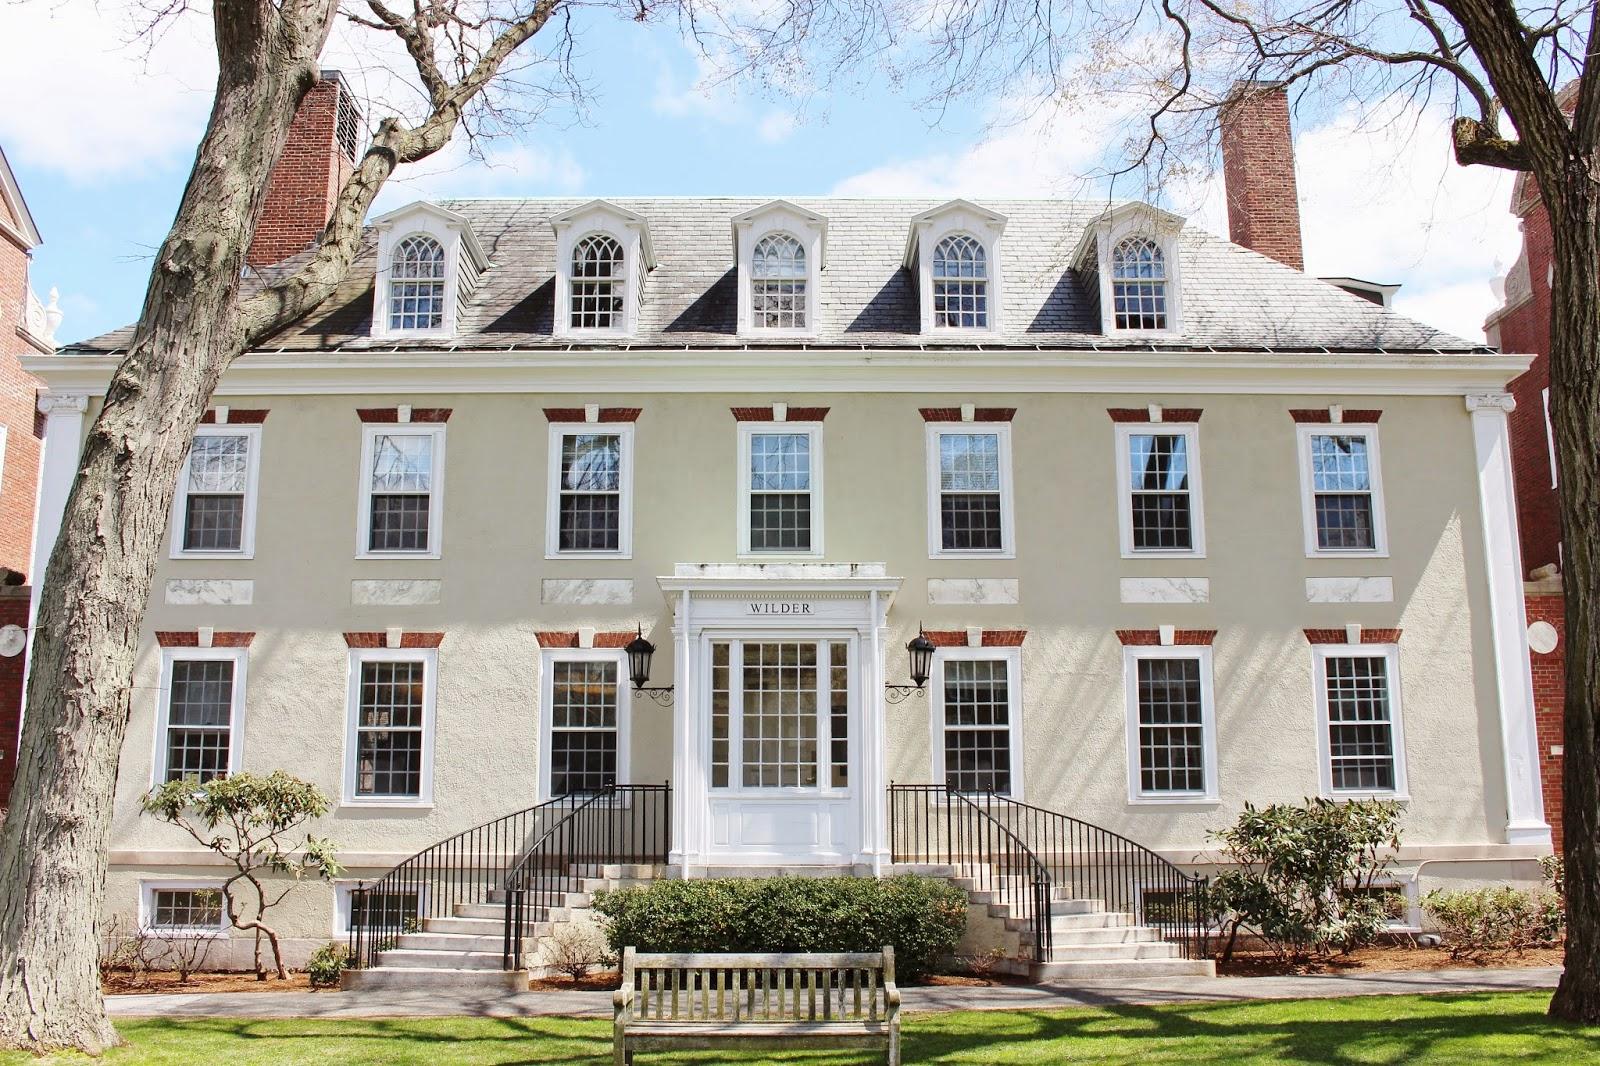 bijuleni - wilder building Harvard